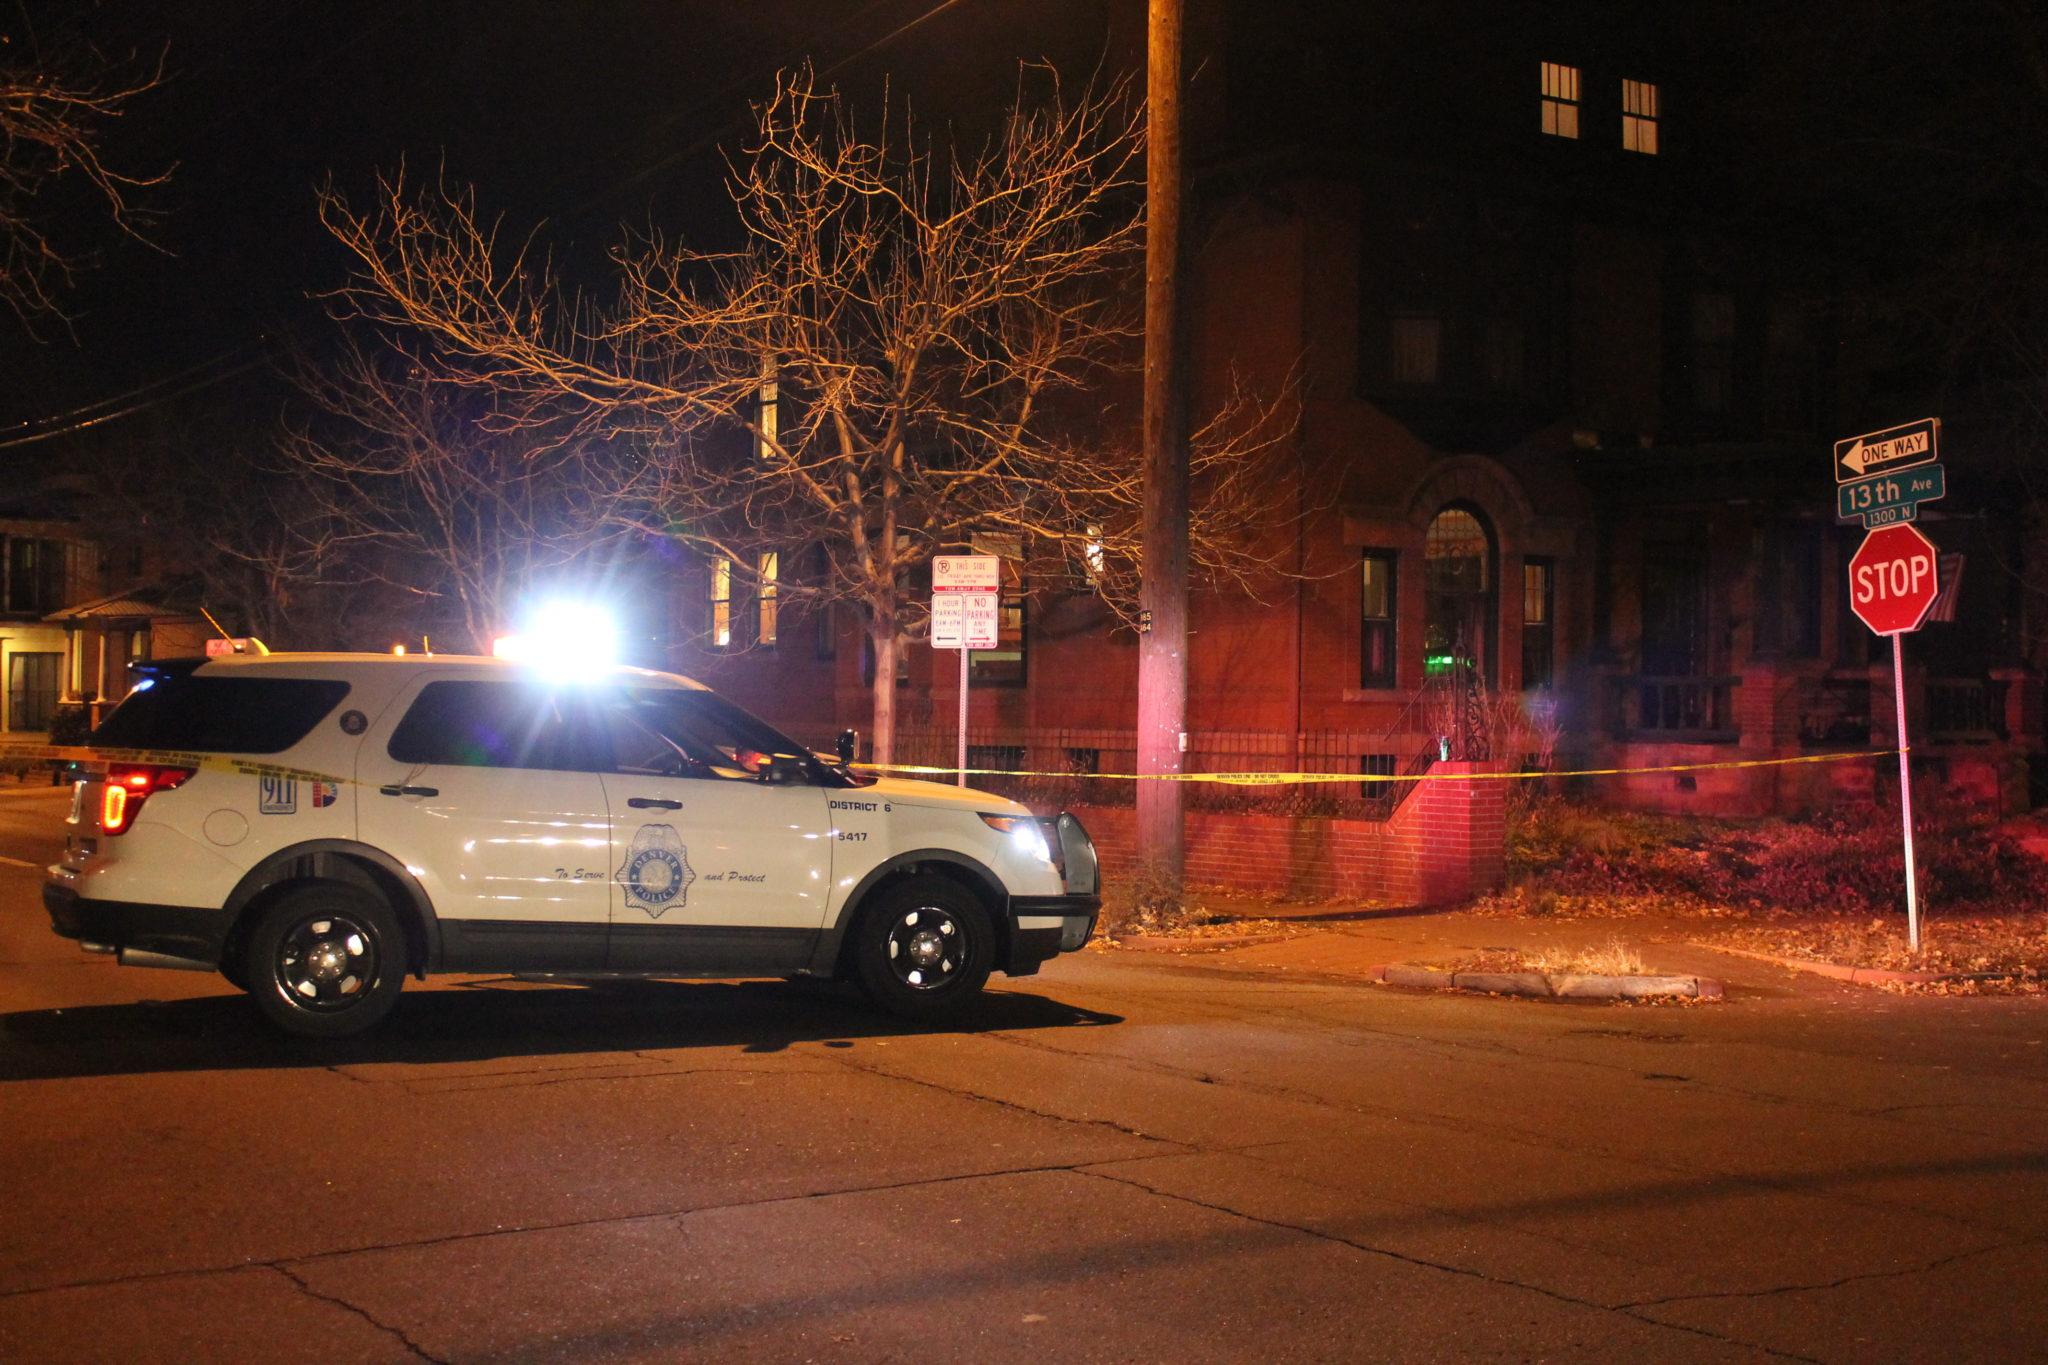 Denver police blocked off the area around a homicide investigation at 13th Avenue and Marion Street. Nov. 22, 2016. (Ashley Dean/Denverite)